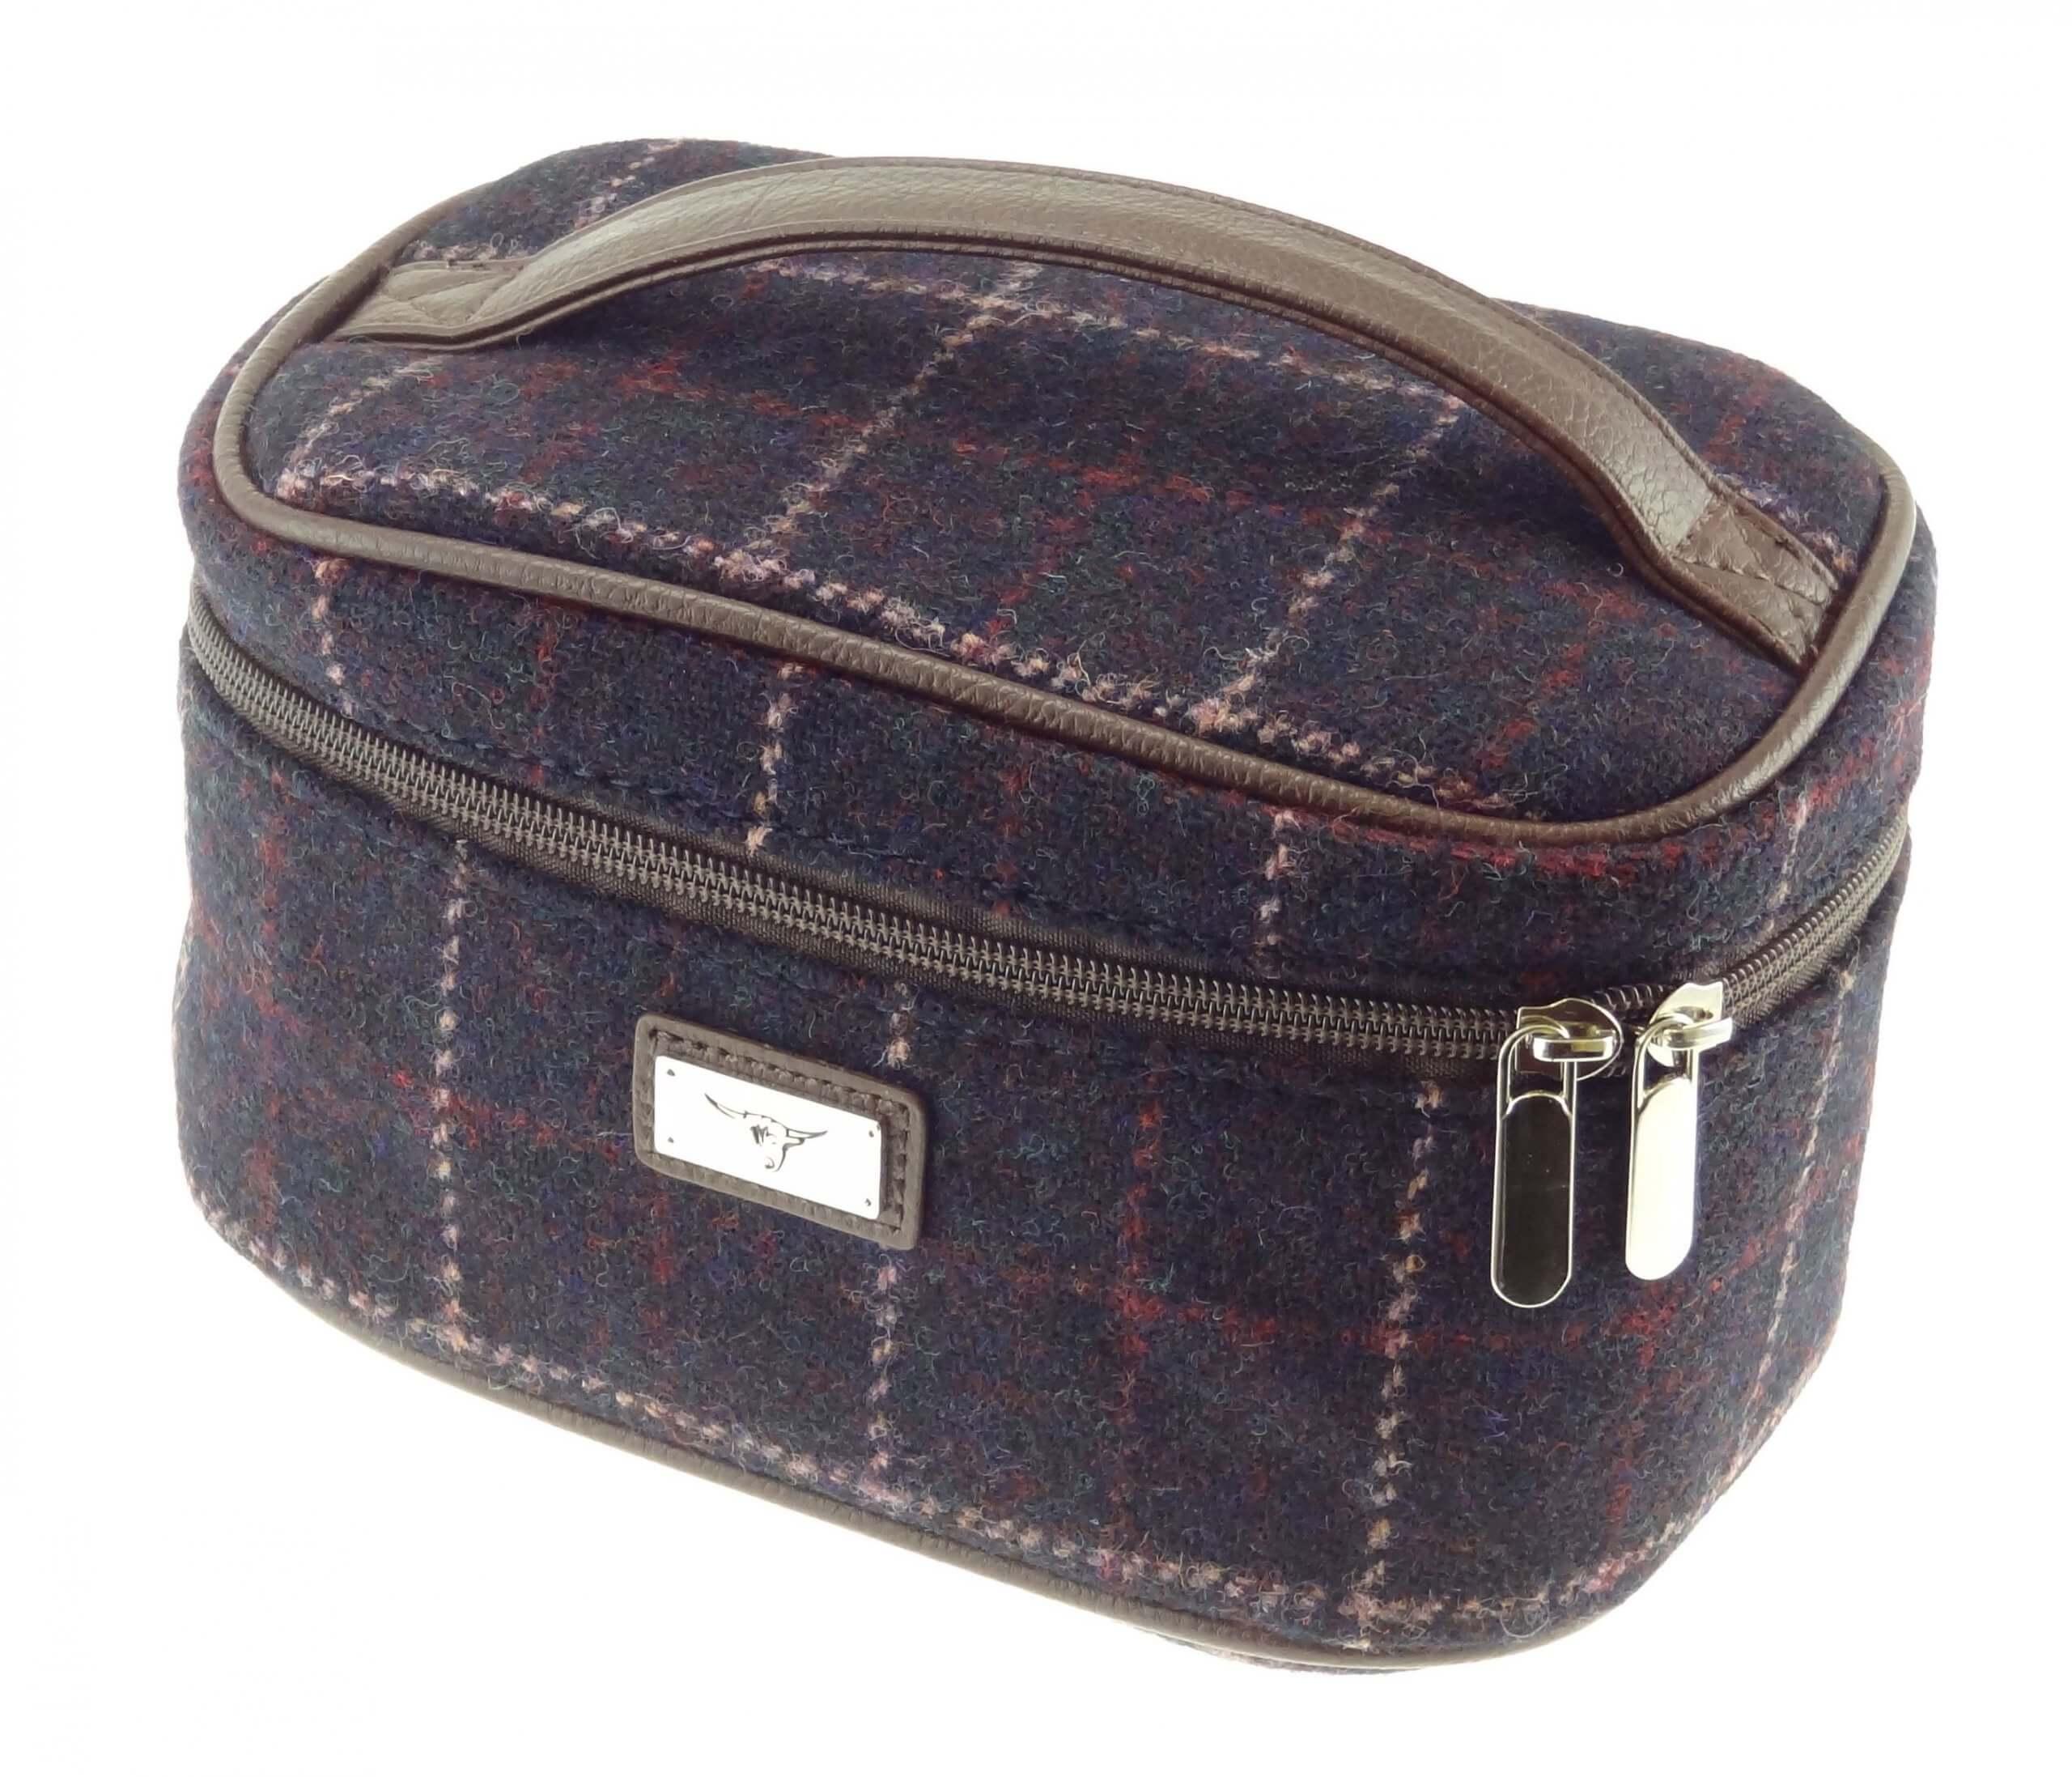 Harris Tweed Cosmetic Bag LB2103-COL39